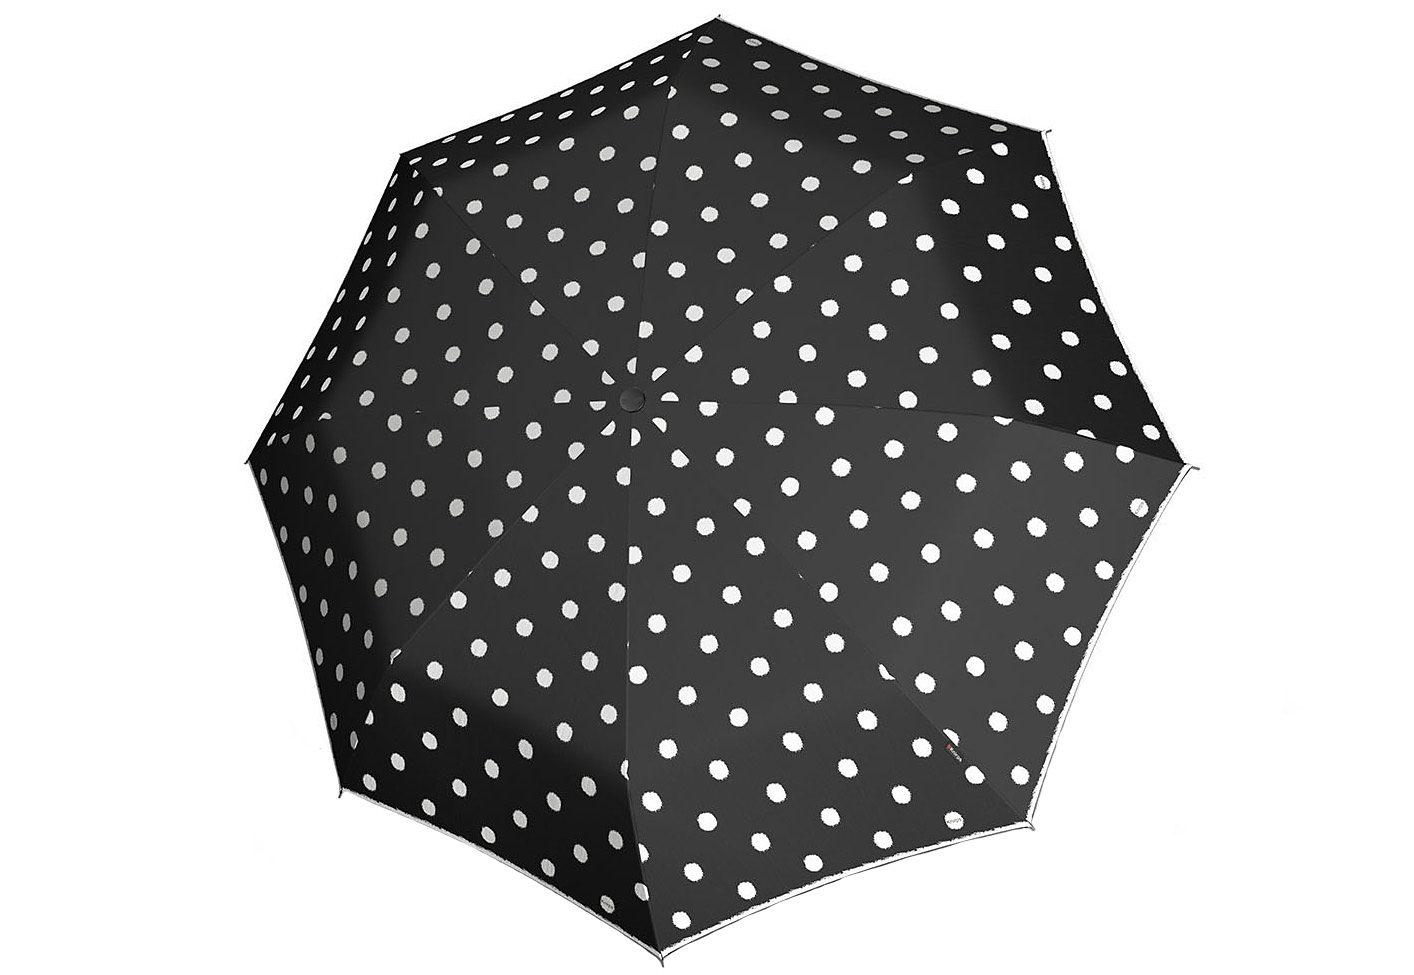 Knirps Regenschirm, »Stick Langschirm Automatik - Punkte schwarz«